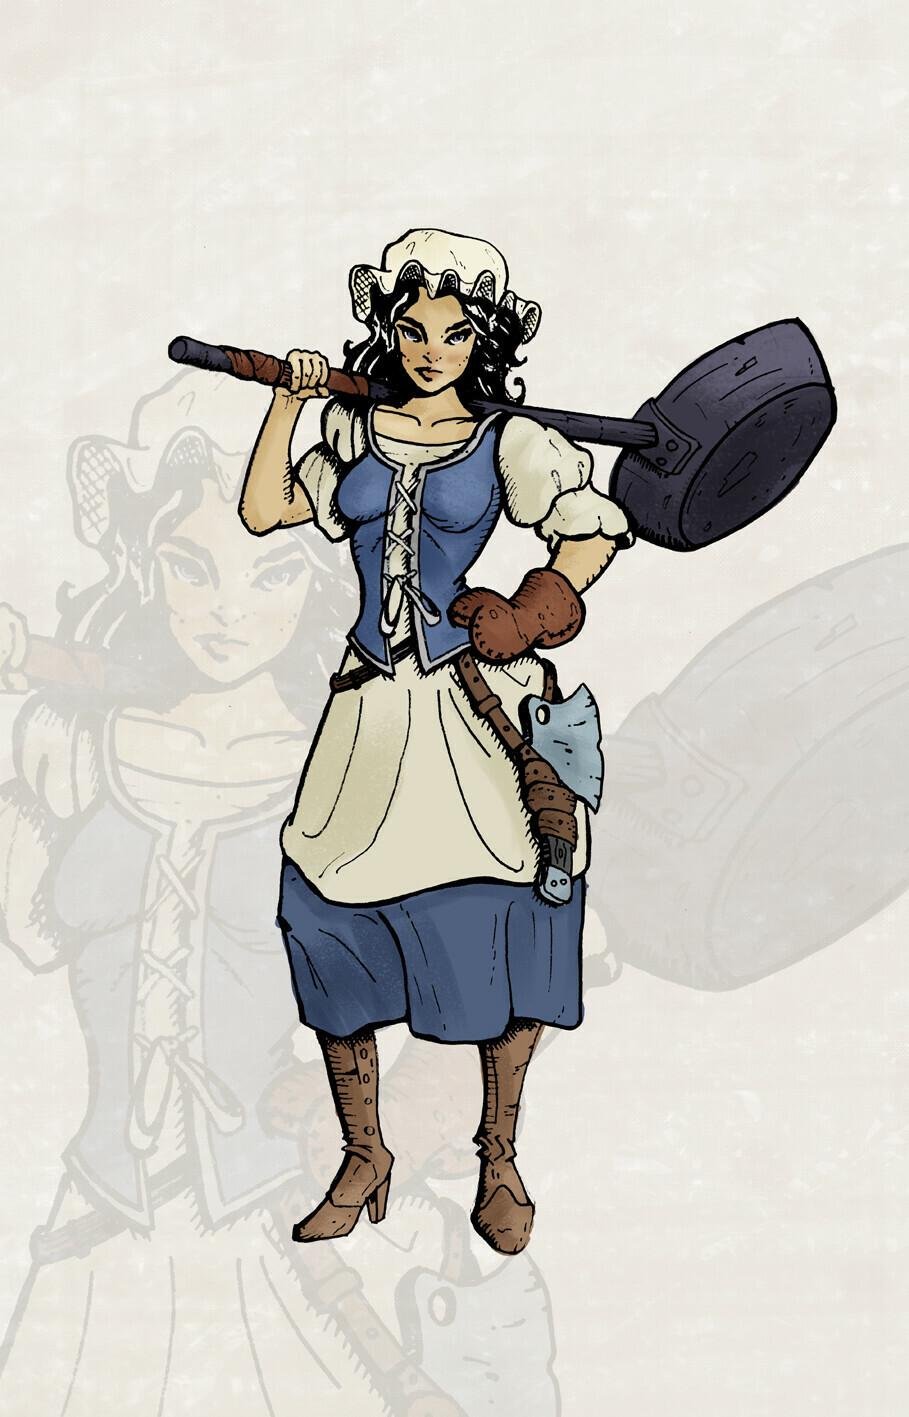 Teresanna from Tauringa